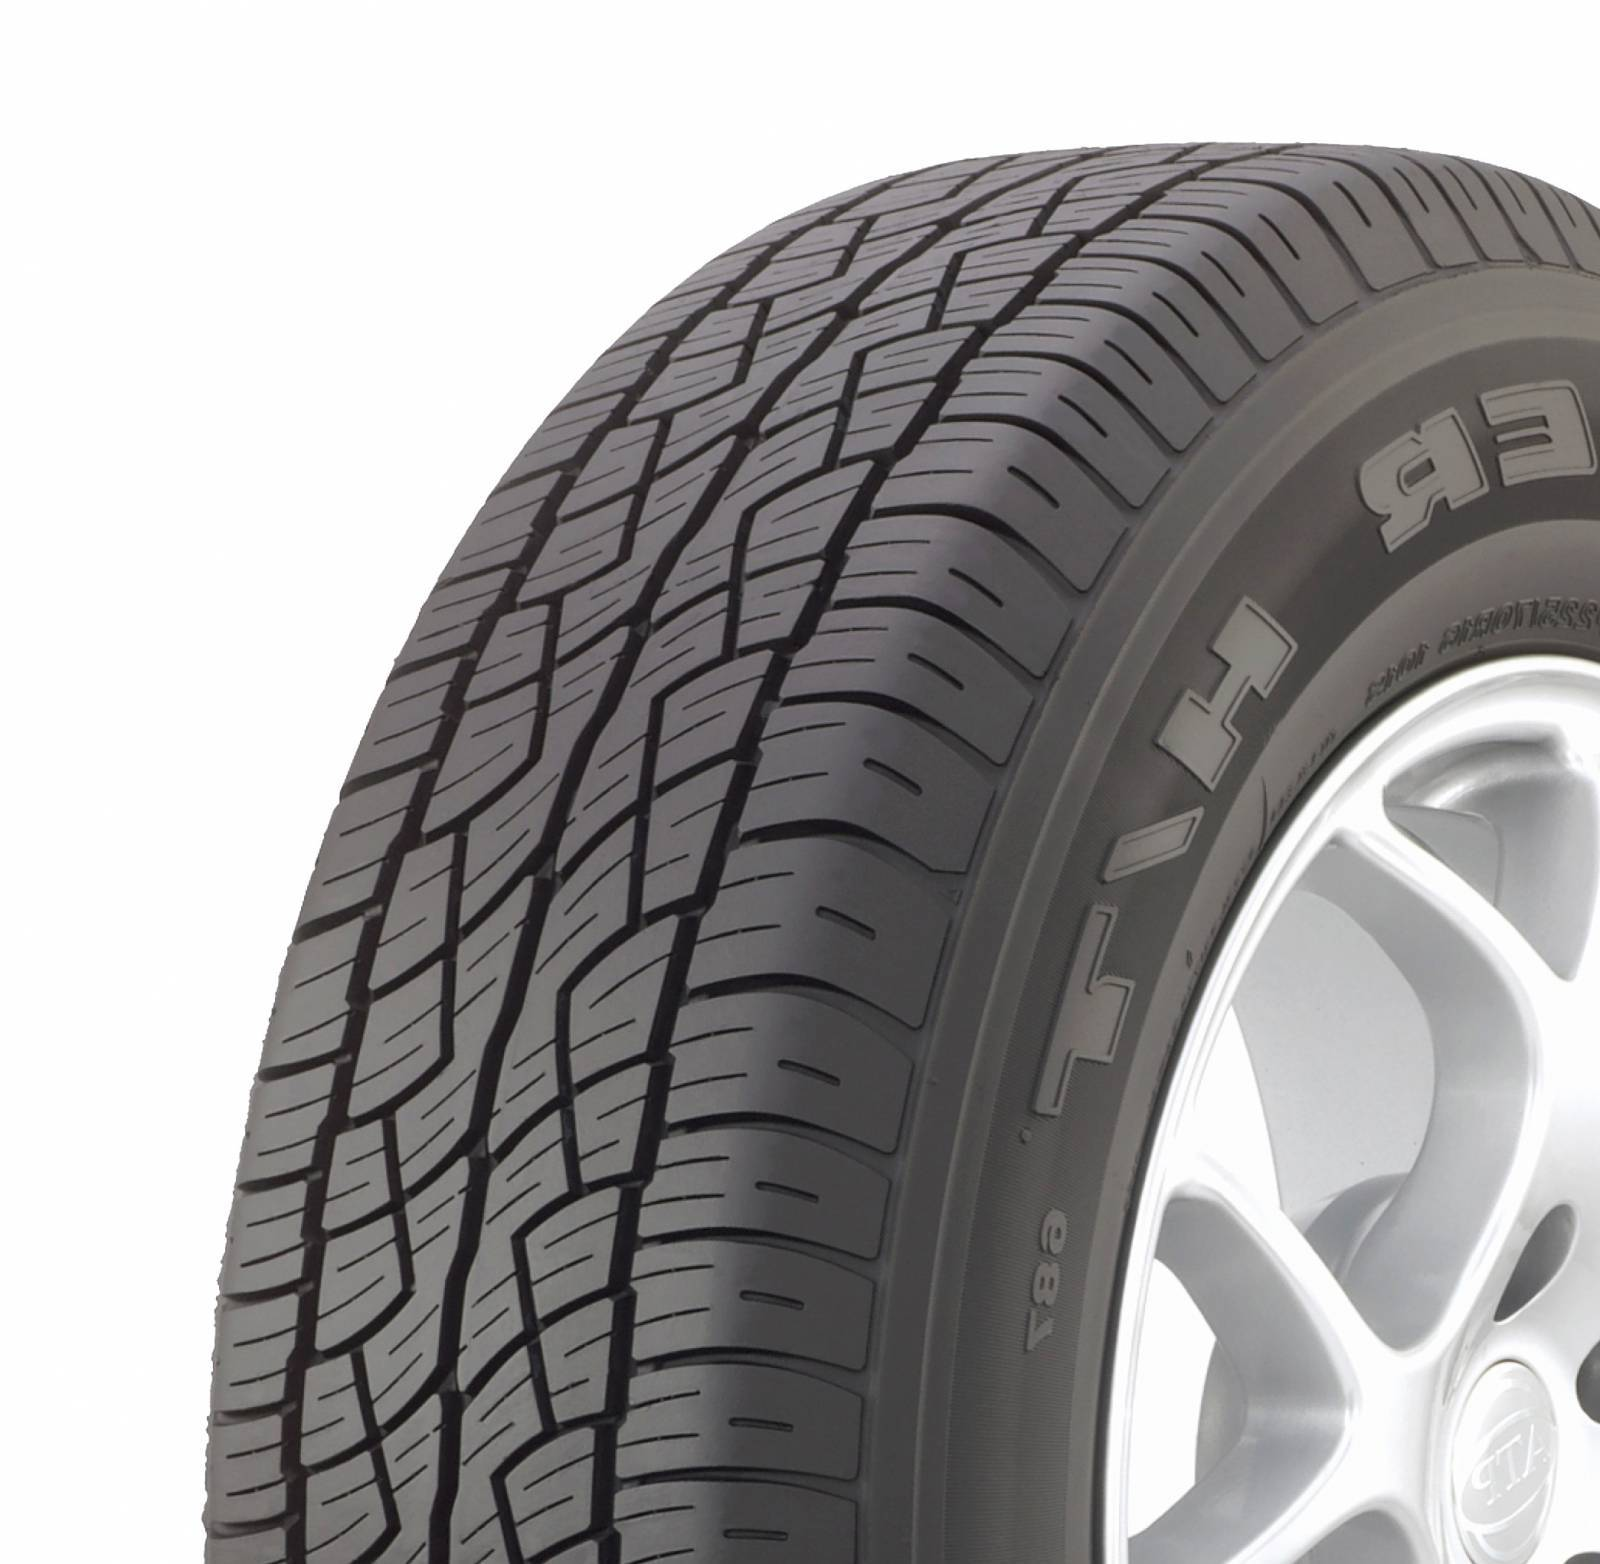 Pneu Bridgestone Dueler H/T 687 225/65 R17 101H - Cantele Centro Automotivo